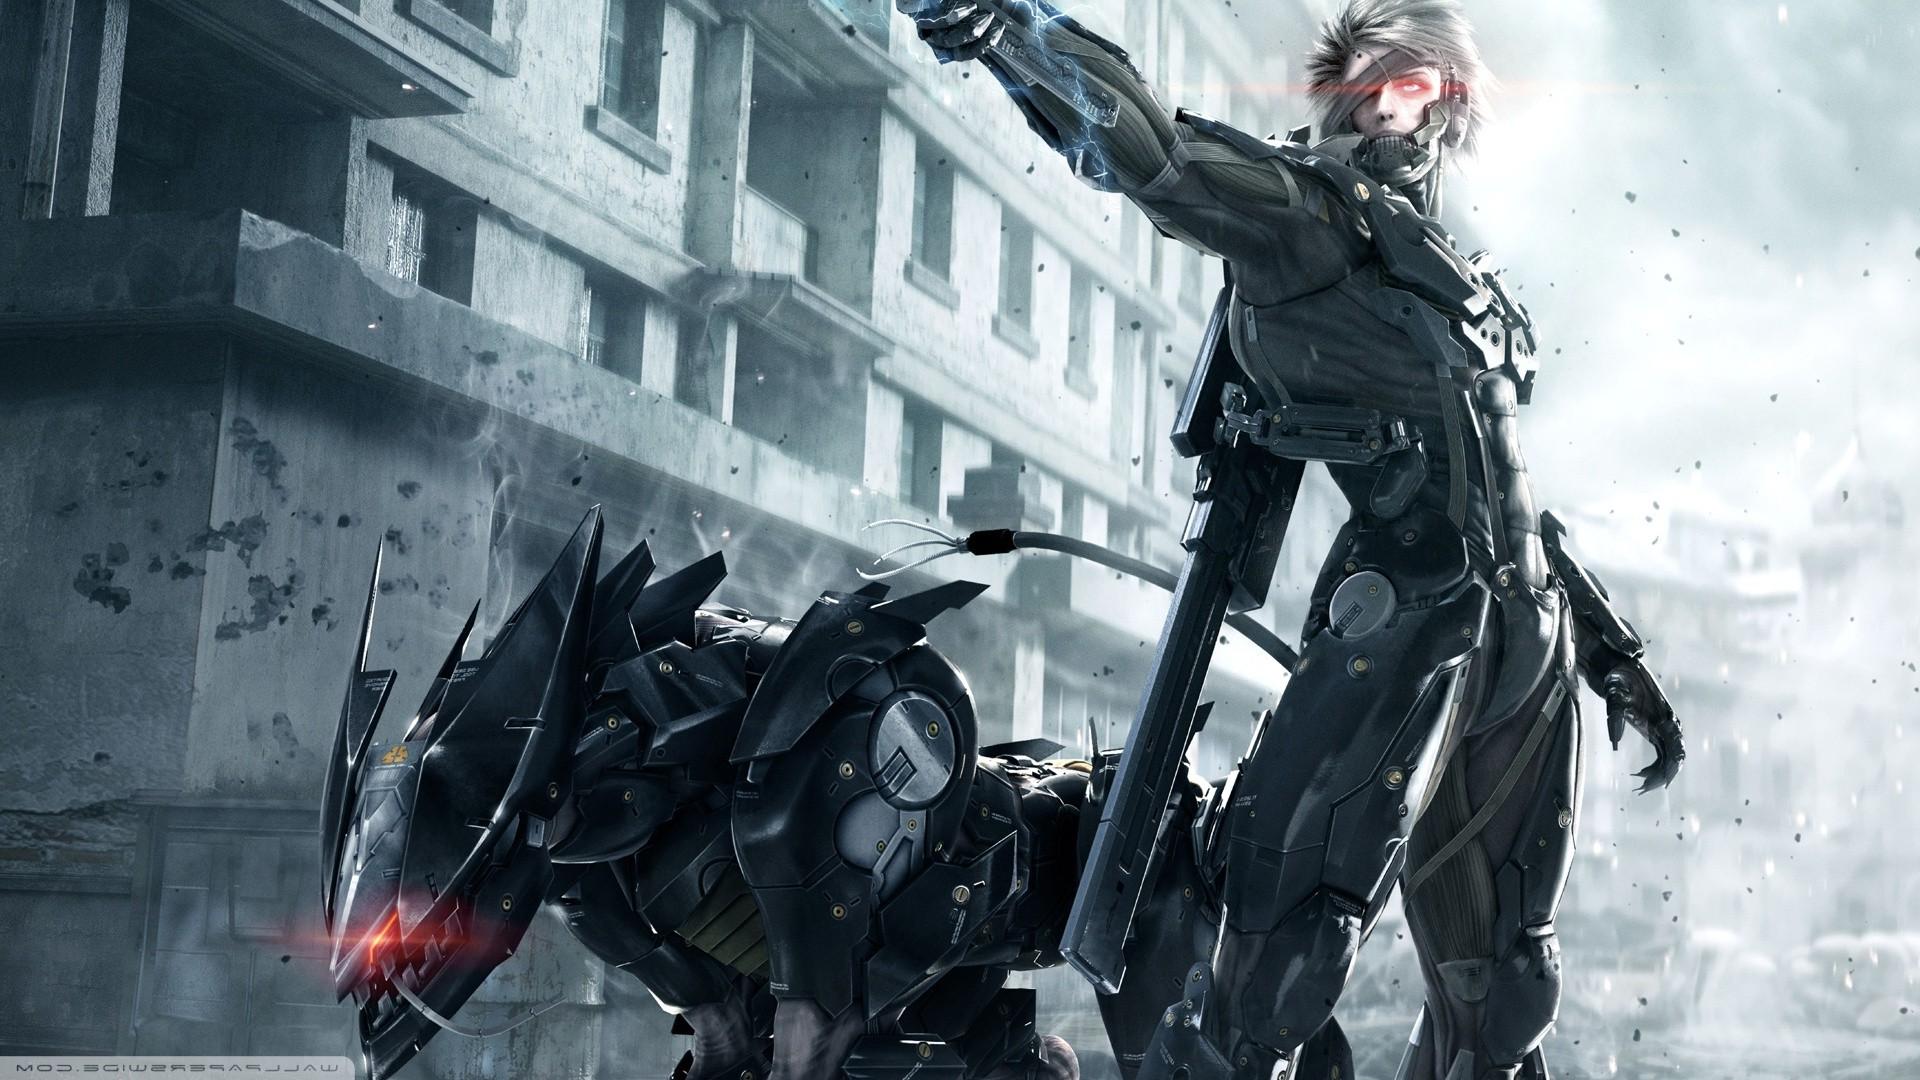 Wallpaper : gun, video games, weapon, soldier, Metal Gear